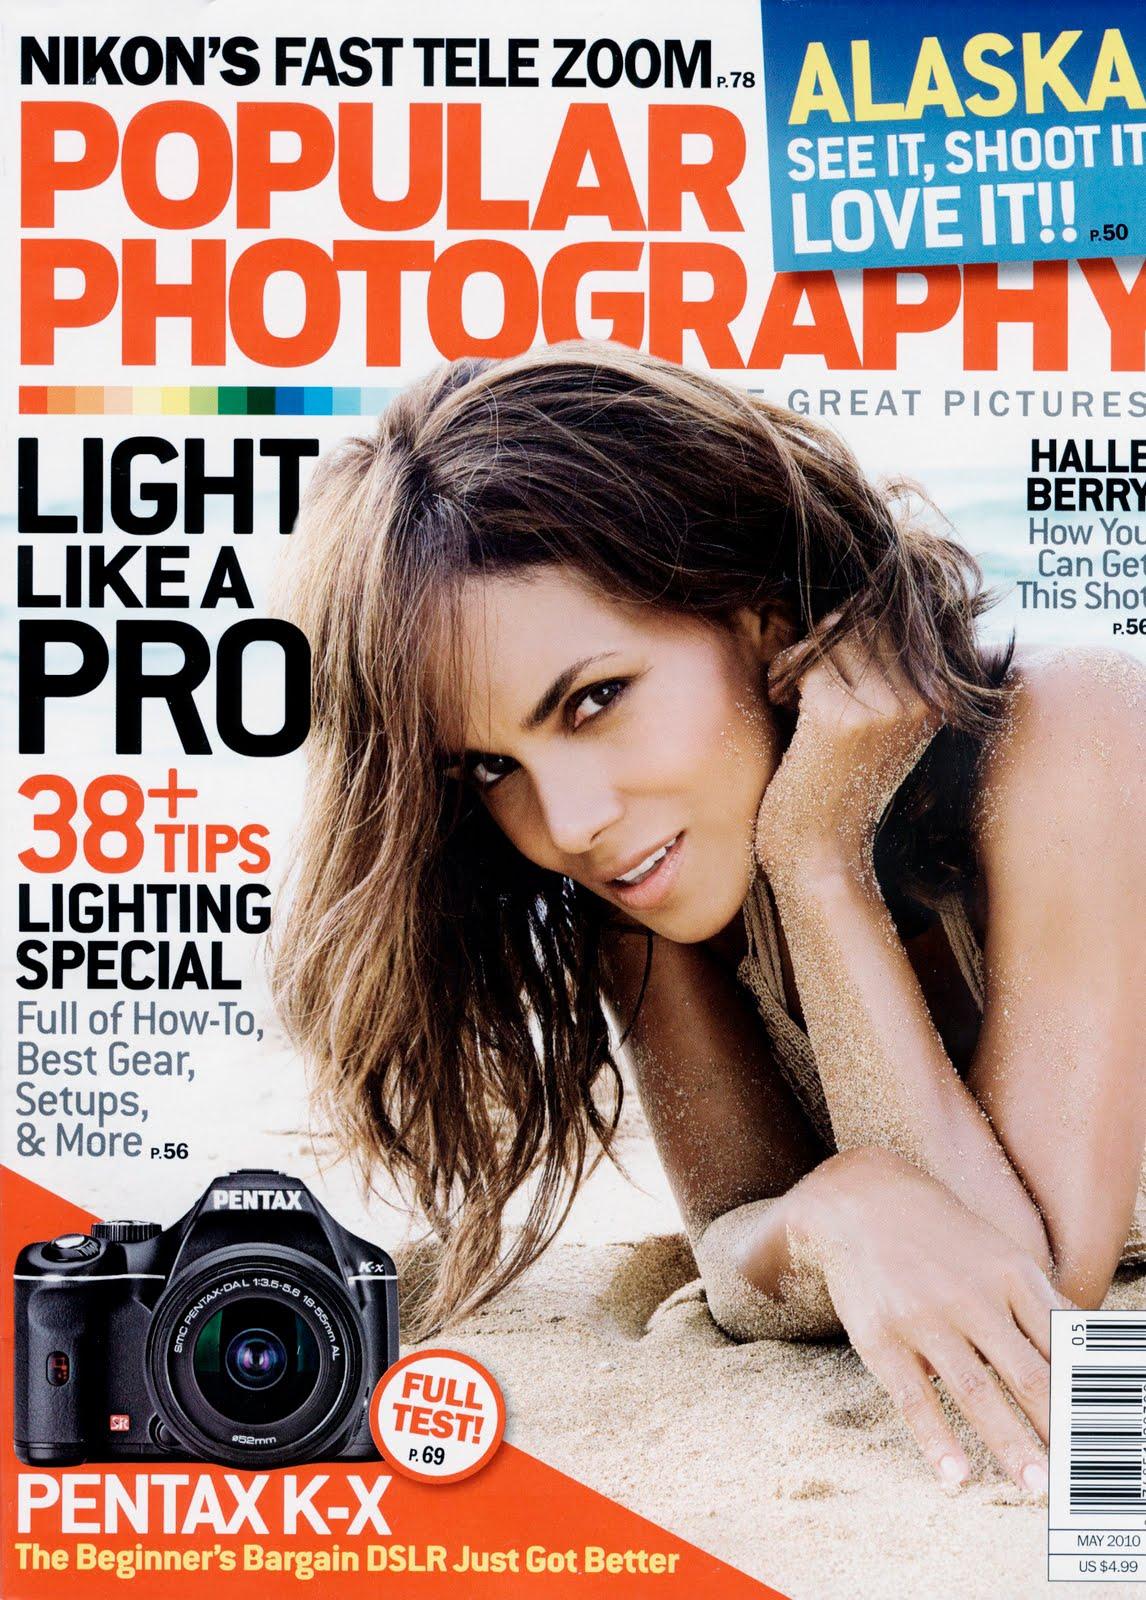 CHEYENNE ELLIS PHOTOGRAPHY: POPULAR PHOTOGRAPHY MAGAZINE: cheyenneellis.blogspot.com/2010/04/popular-photography-magazine.html